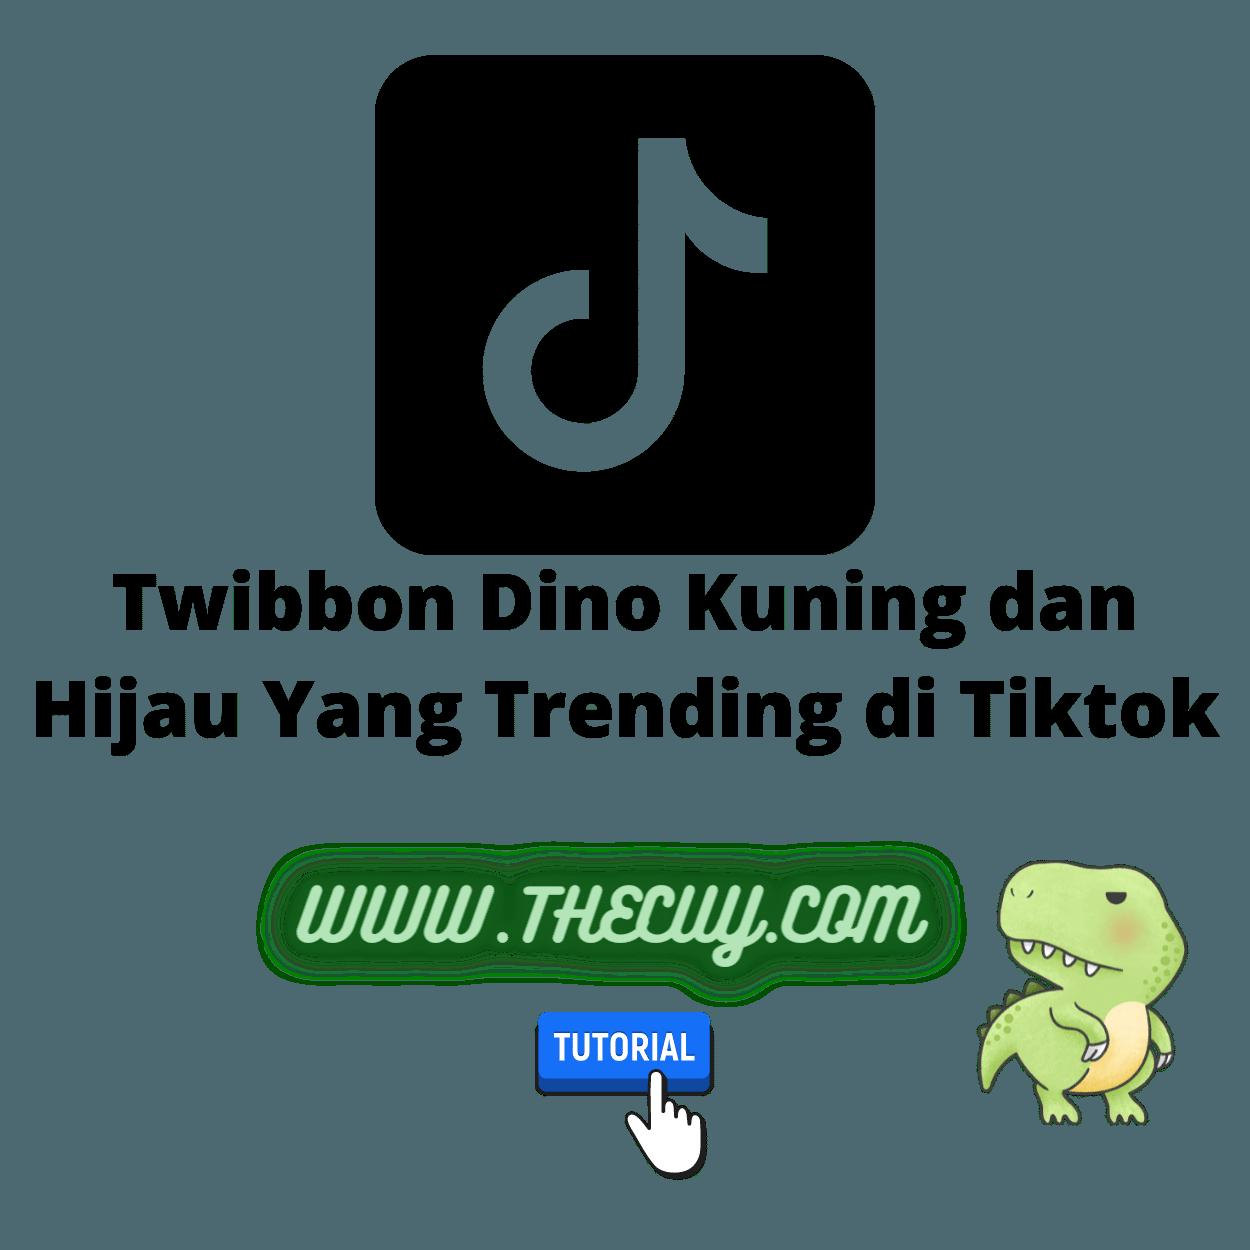 Twibbon Dino Kuning dan Hijau Yang Trending di Tiktok